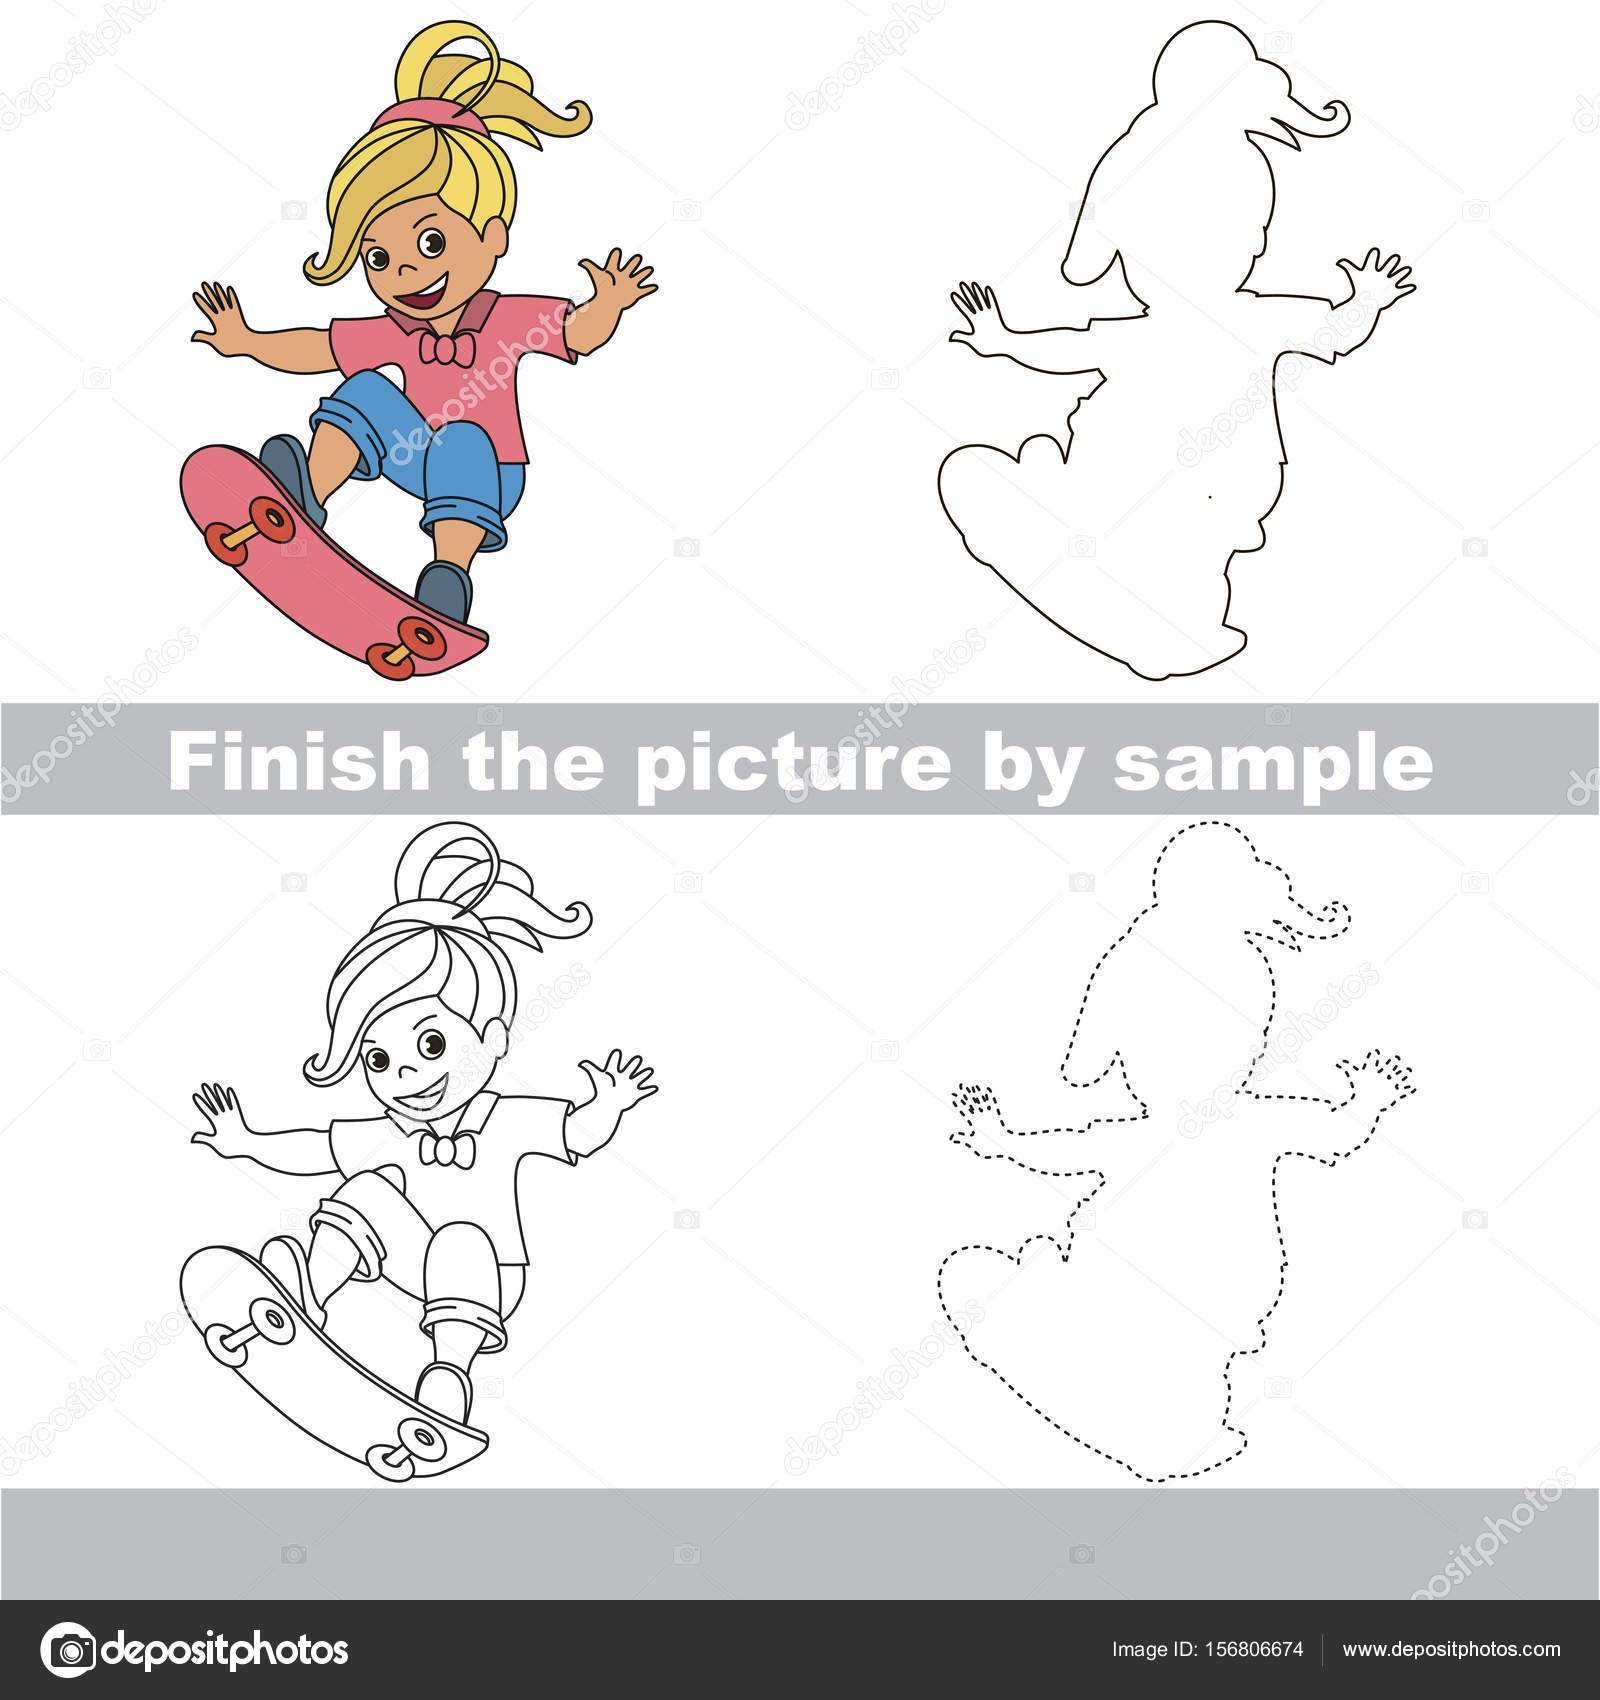 Kresba Listu Pro Predskolni Deti Snadne Hrani Stupen Obtiznosti